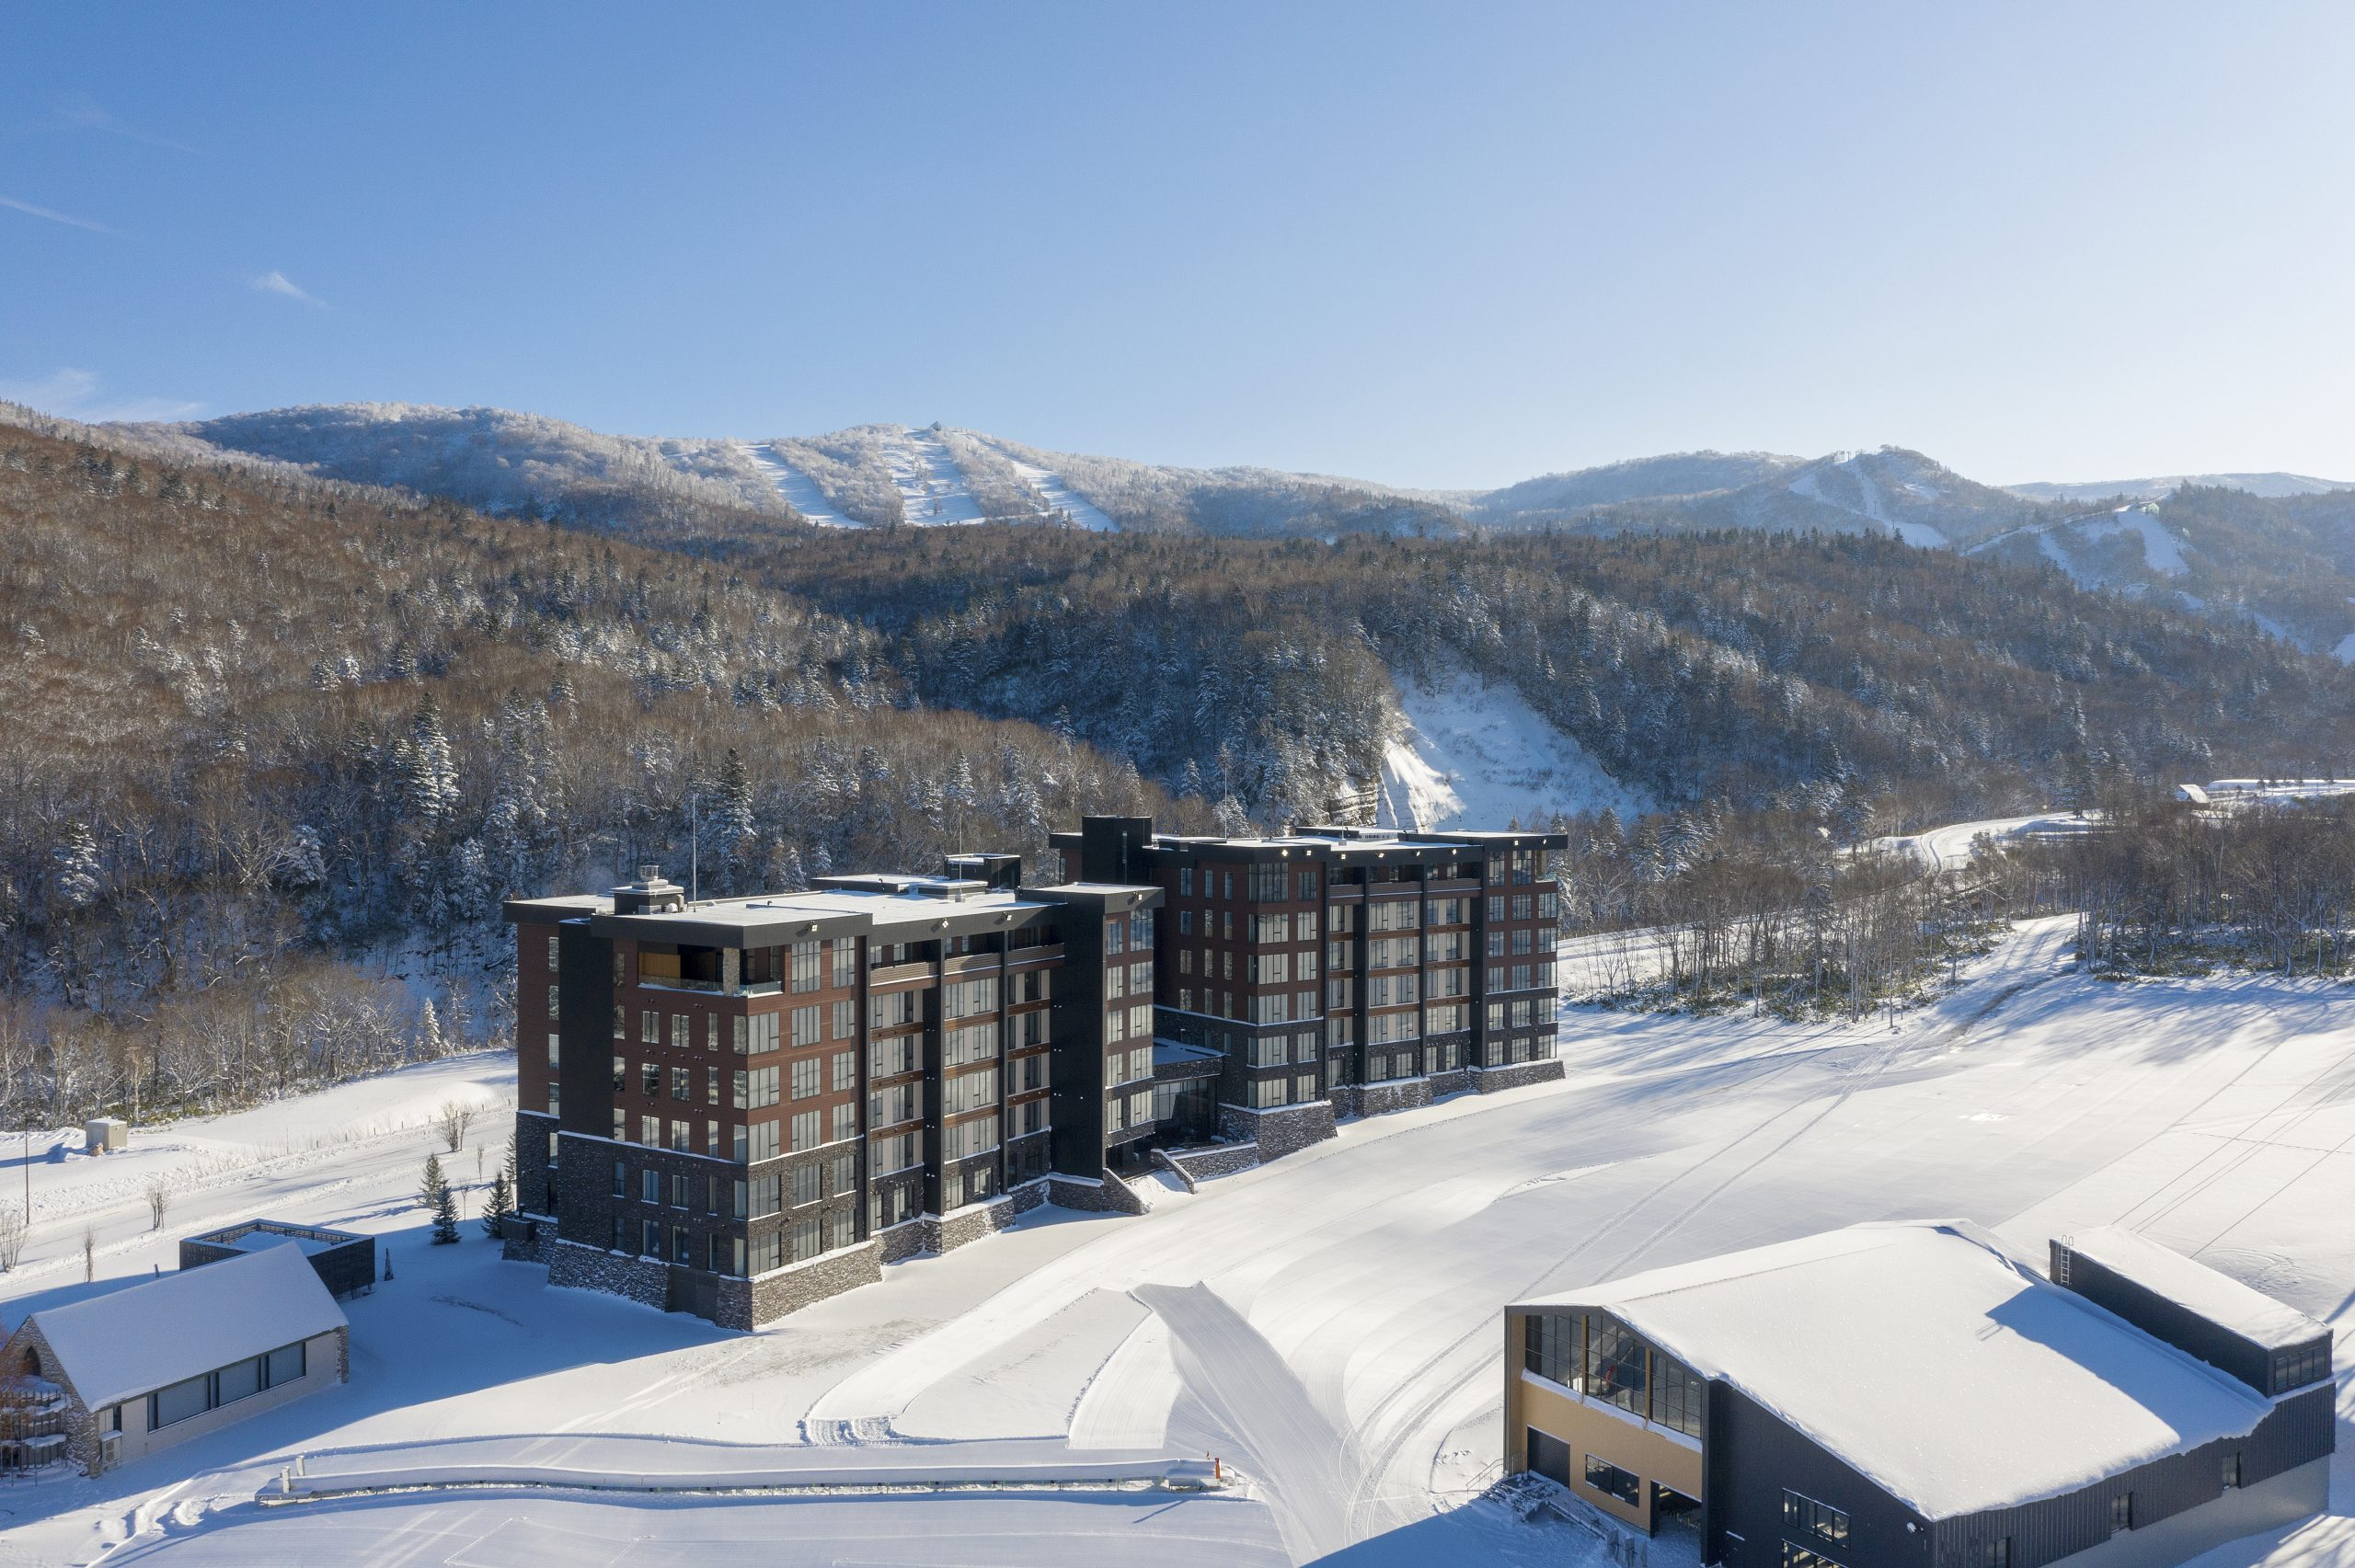 Yu Kiroro - Kiroro 首座豪華滑雪共管式度假村